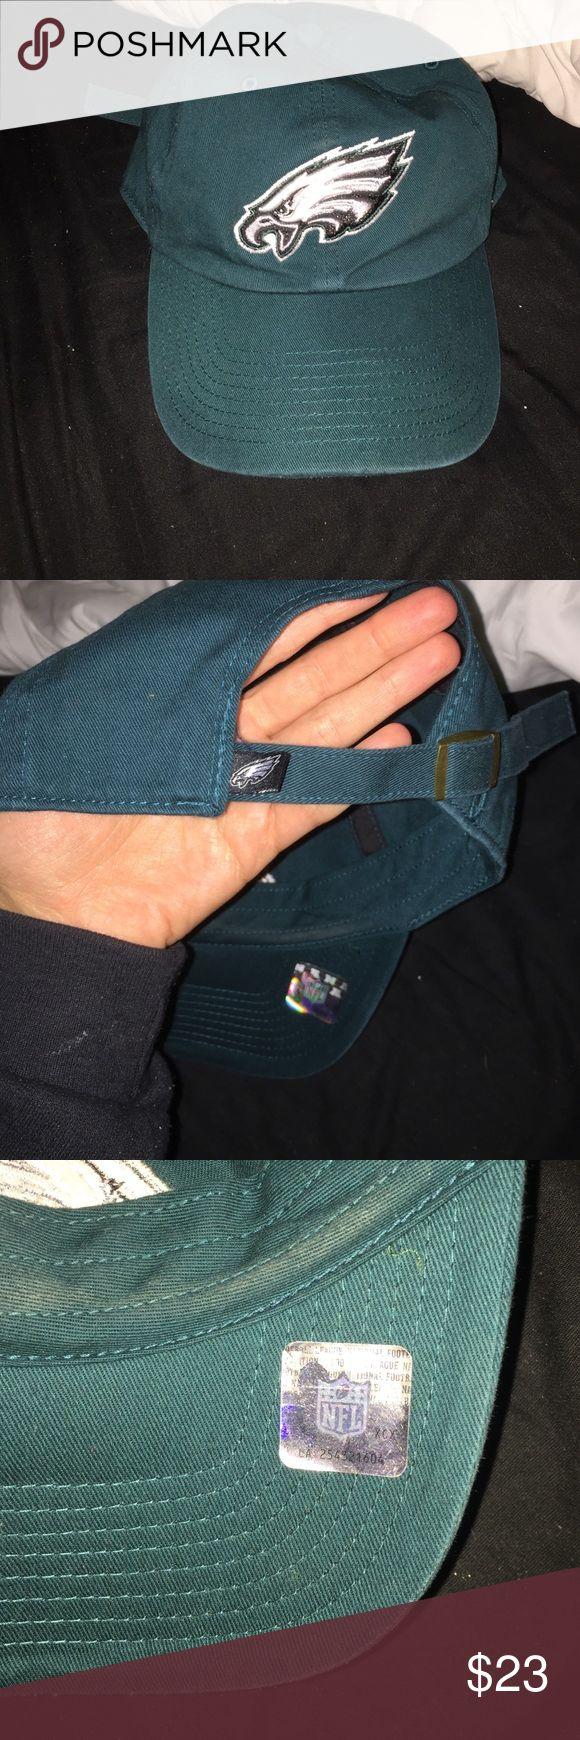 NFL Philadelphia Eagles adjustable hat NFL Philadelphia Eagles adjustable hat. worn a few times. NO TRADES Macy's Accessories Hats